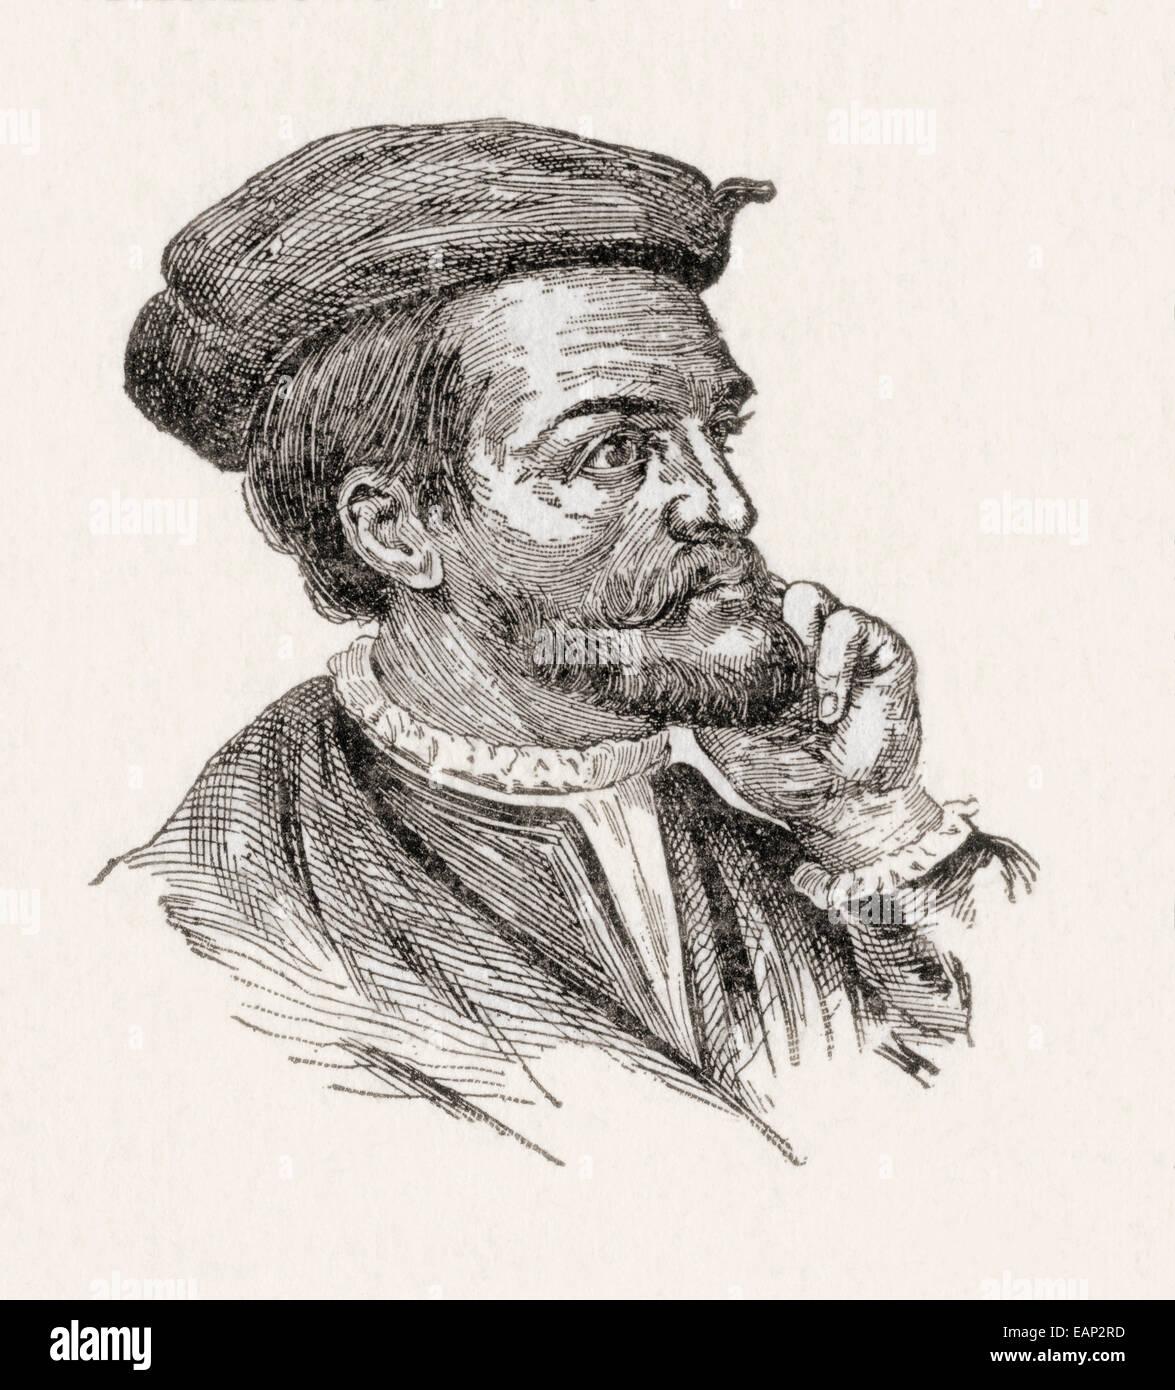 Jacques Cartier, 1491 - 1557. navigatore francese e di explorer. Immagini Stock